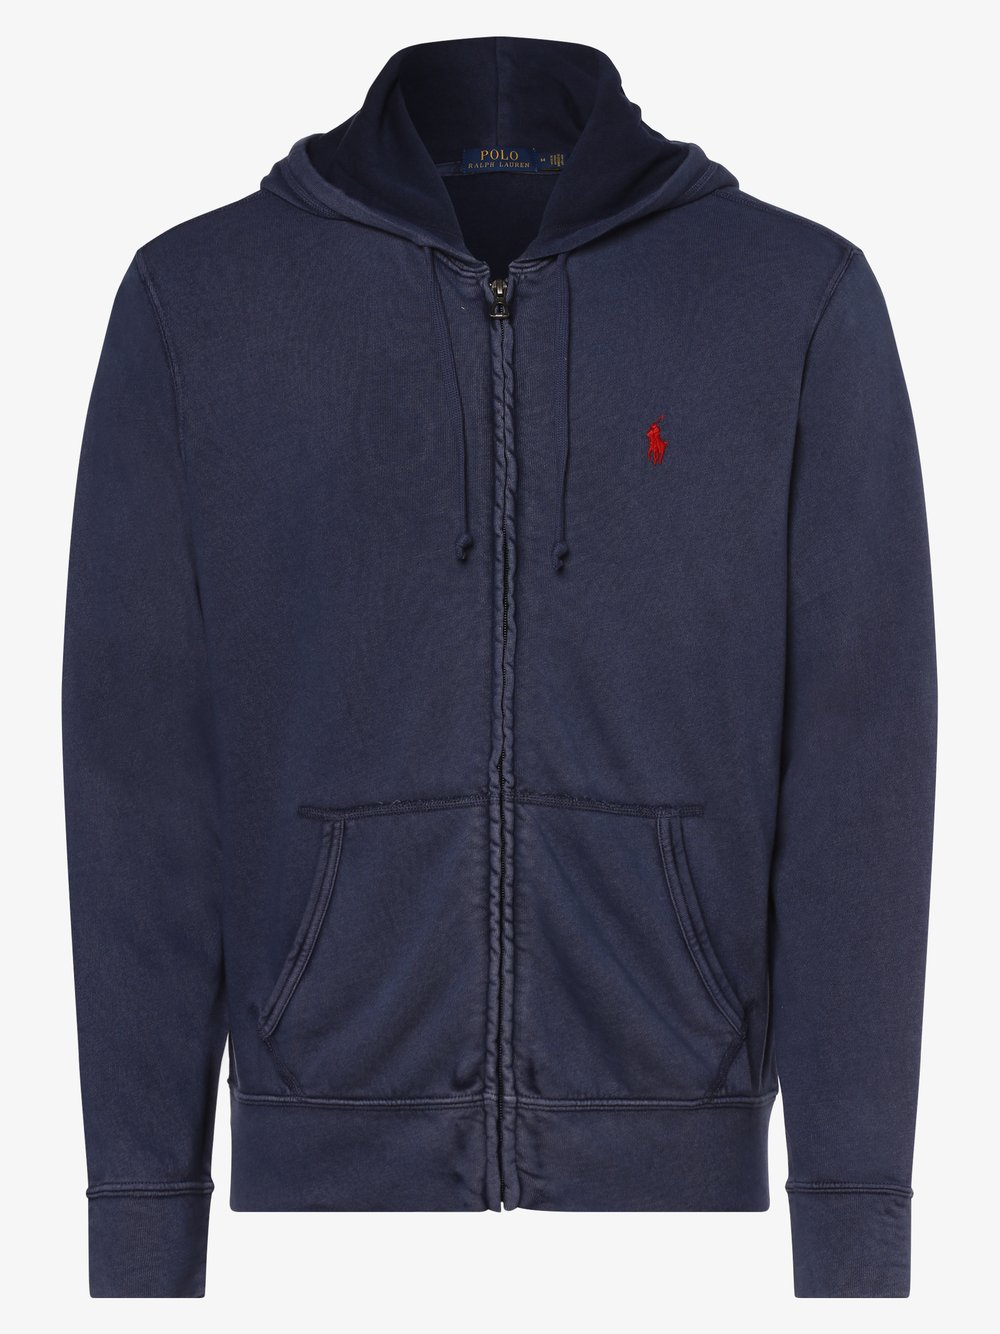 Polo Ralph Lauren - Męska bluza rozpinana, niebieski